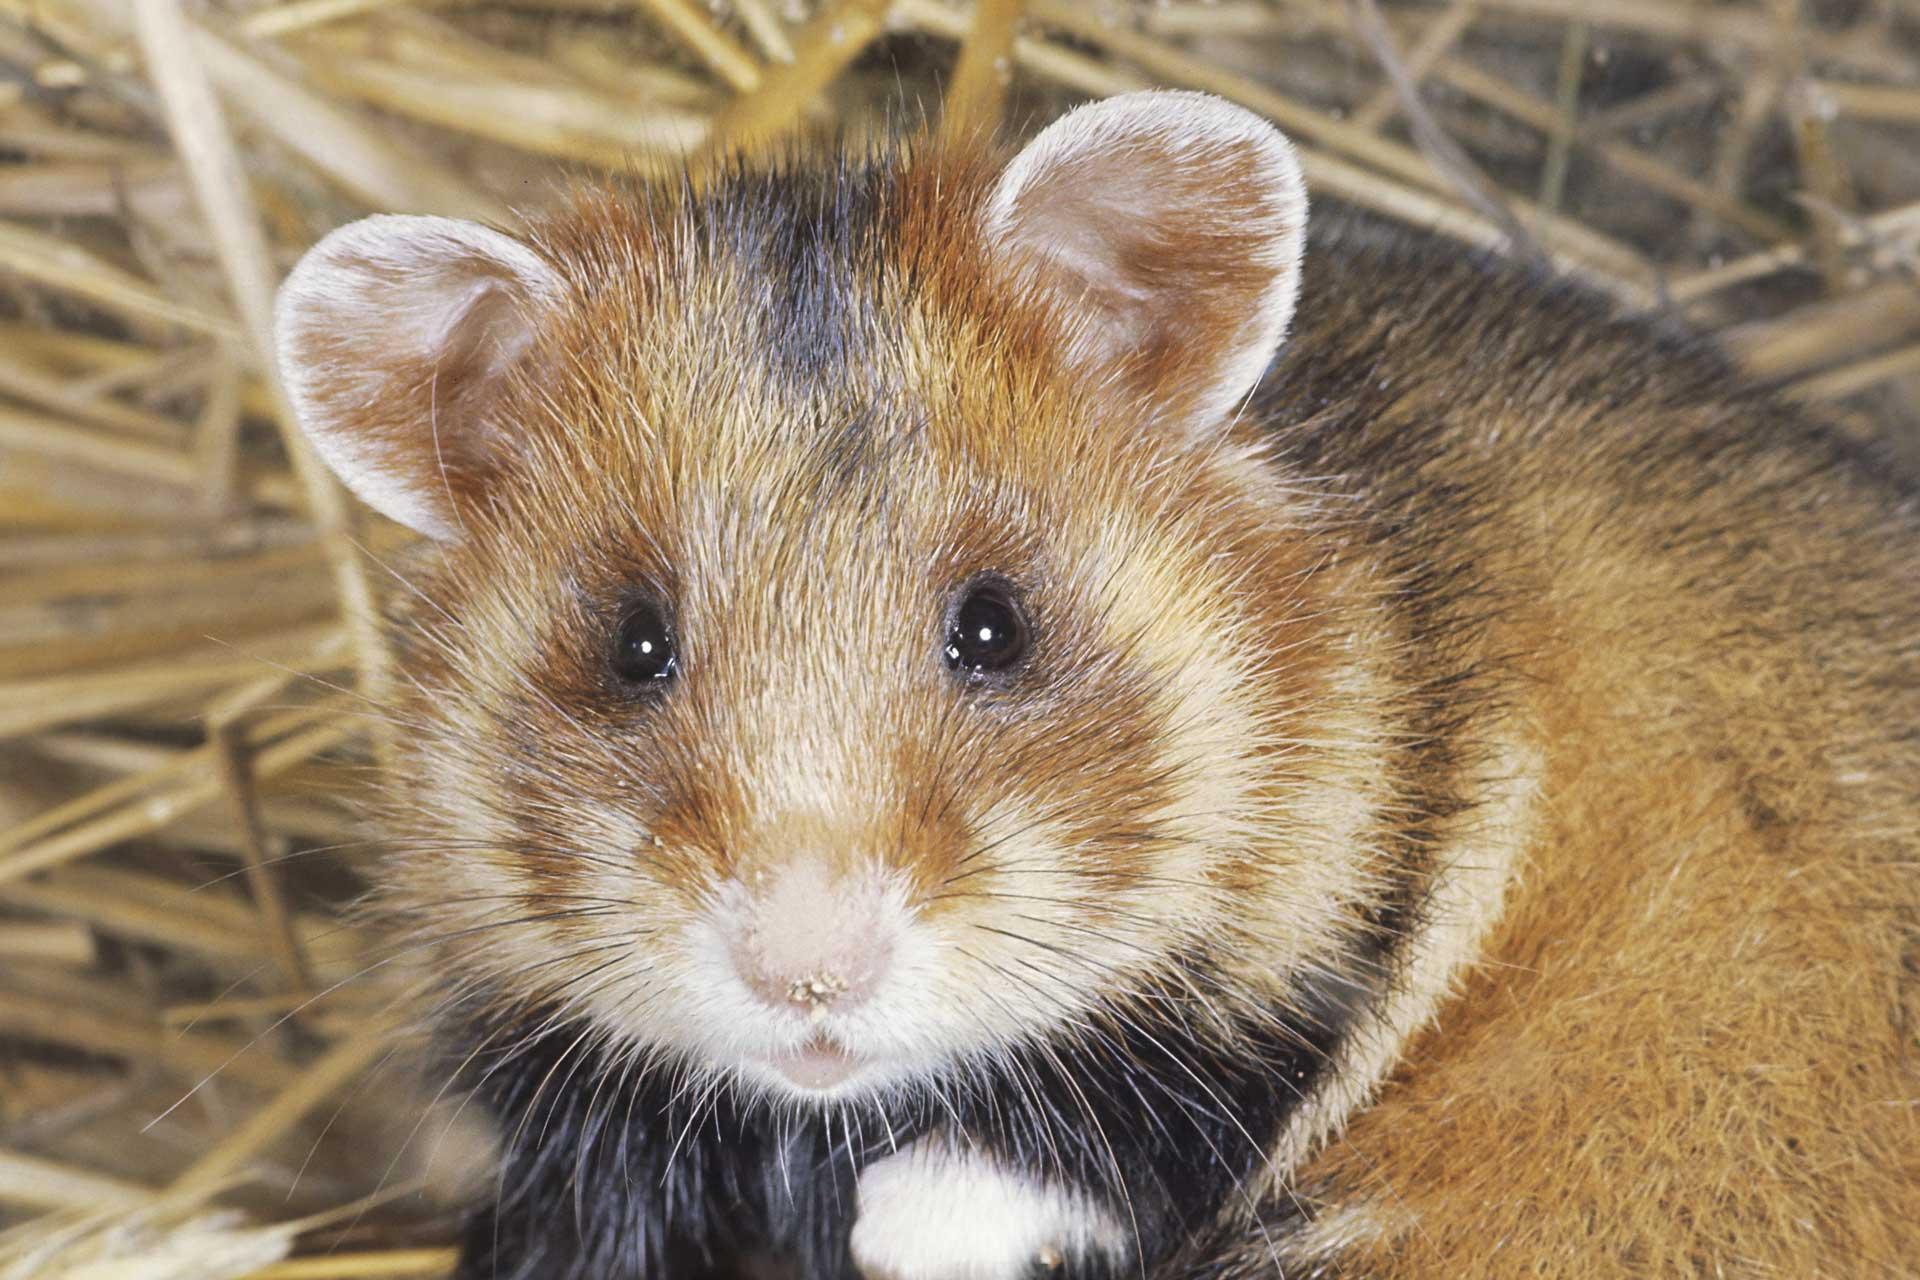 European hamster Cricetus cricetus in its nest.